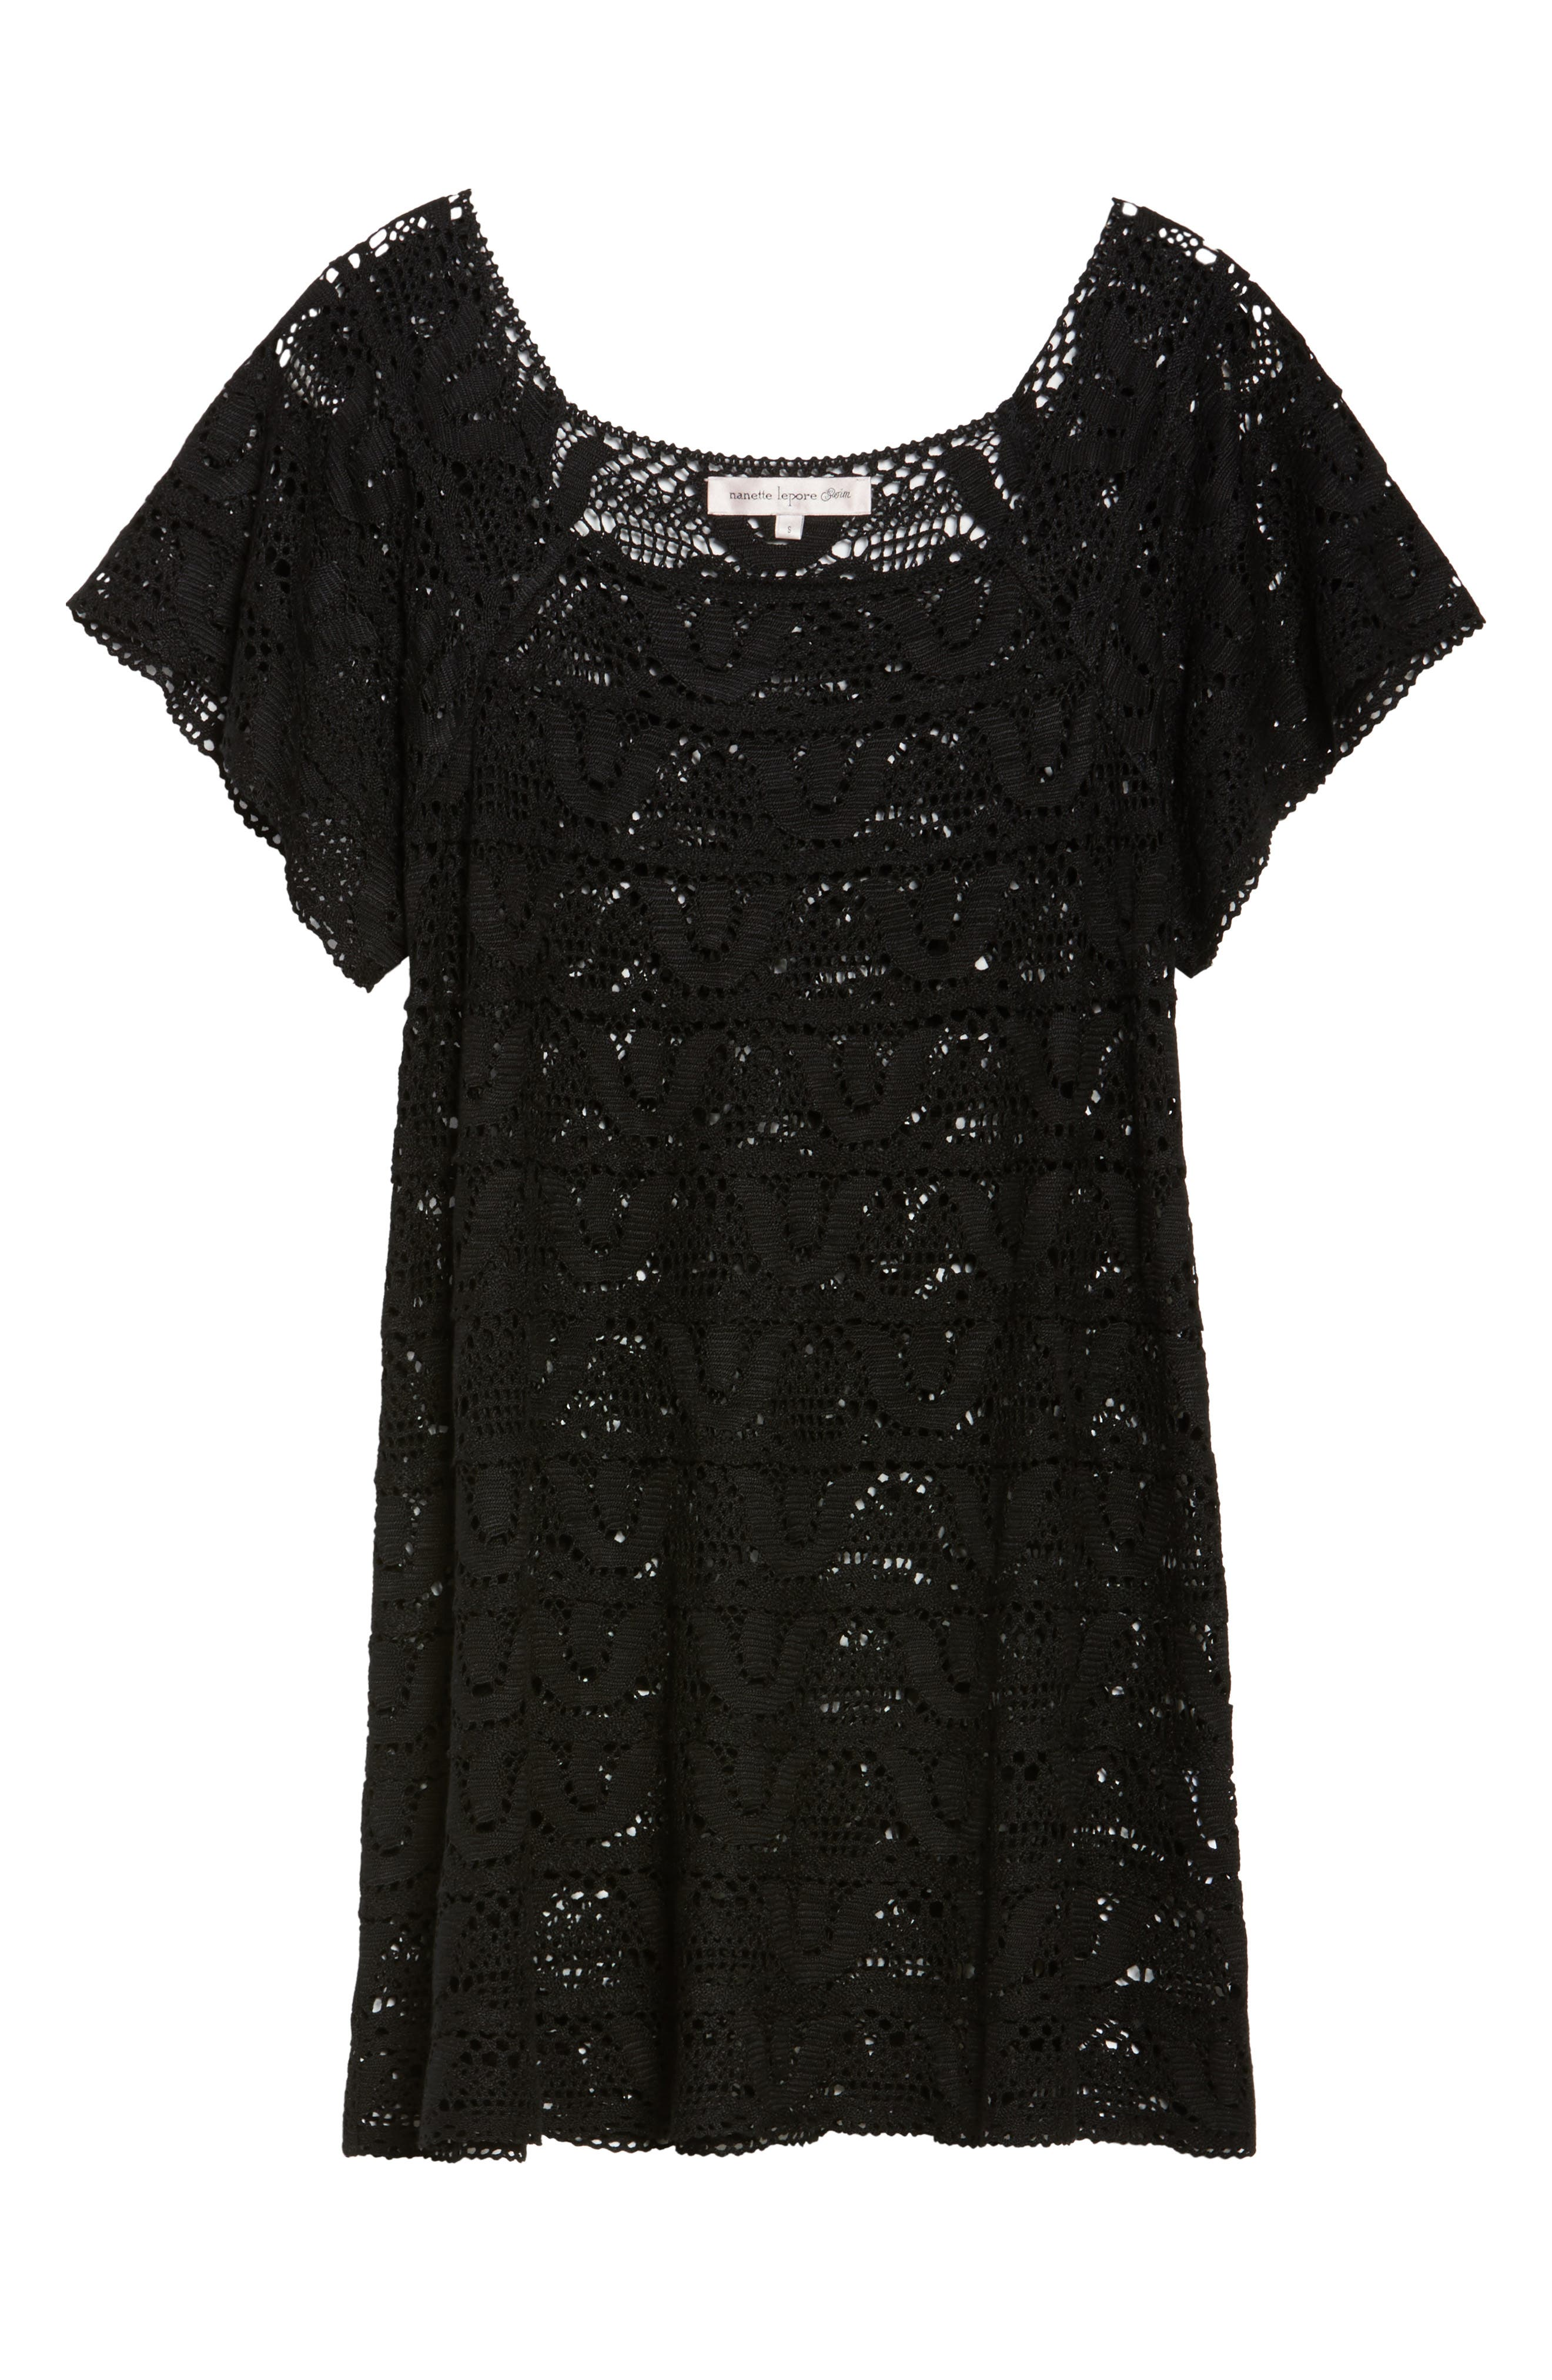 Nanette Lapore Crochet Cover-Up Dress,                             Alternate thumbnail 6, color,                             001